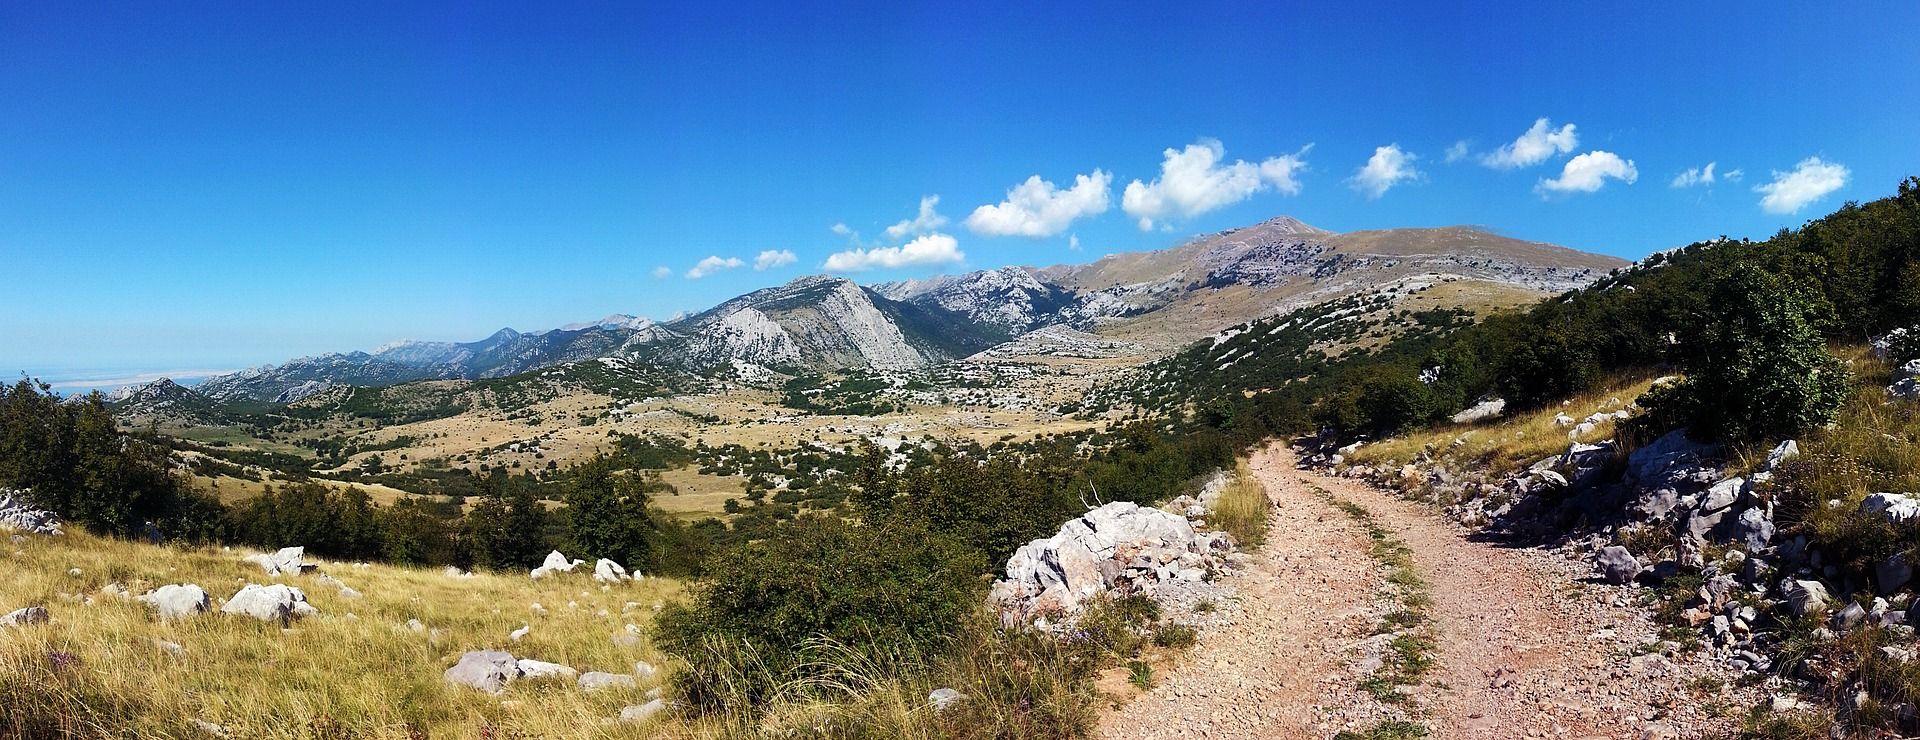 HGSS Spašen planinar na Velebitu